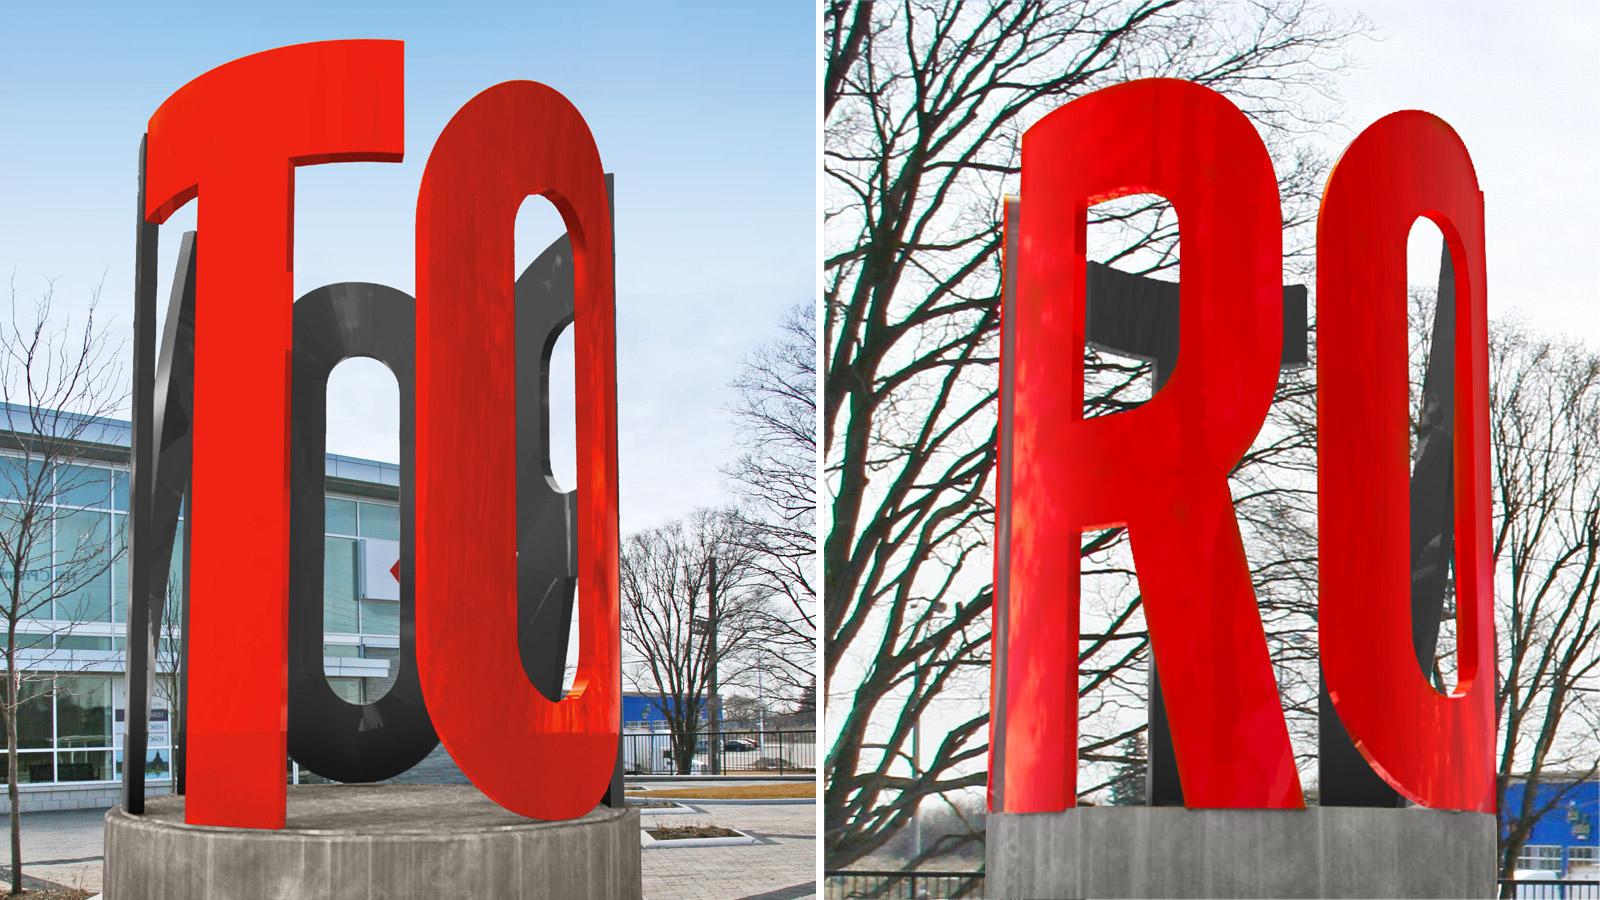 Toronto 360 | Toronto 360 Sculpture | Advertising, Brand Strategy, Design, Strategy